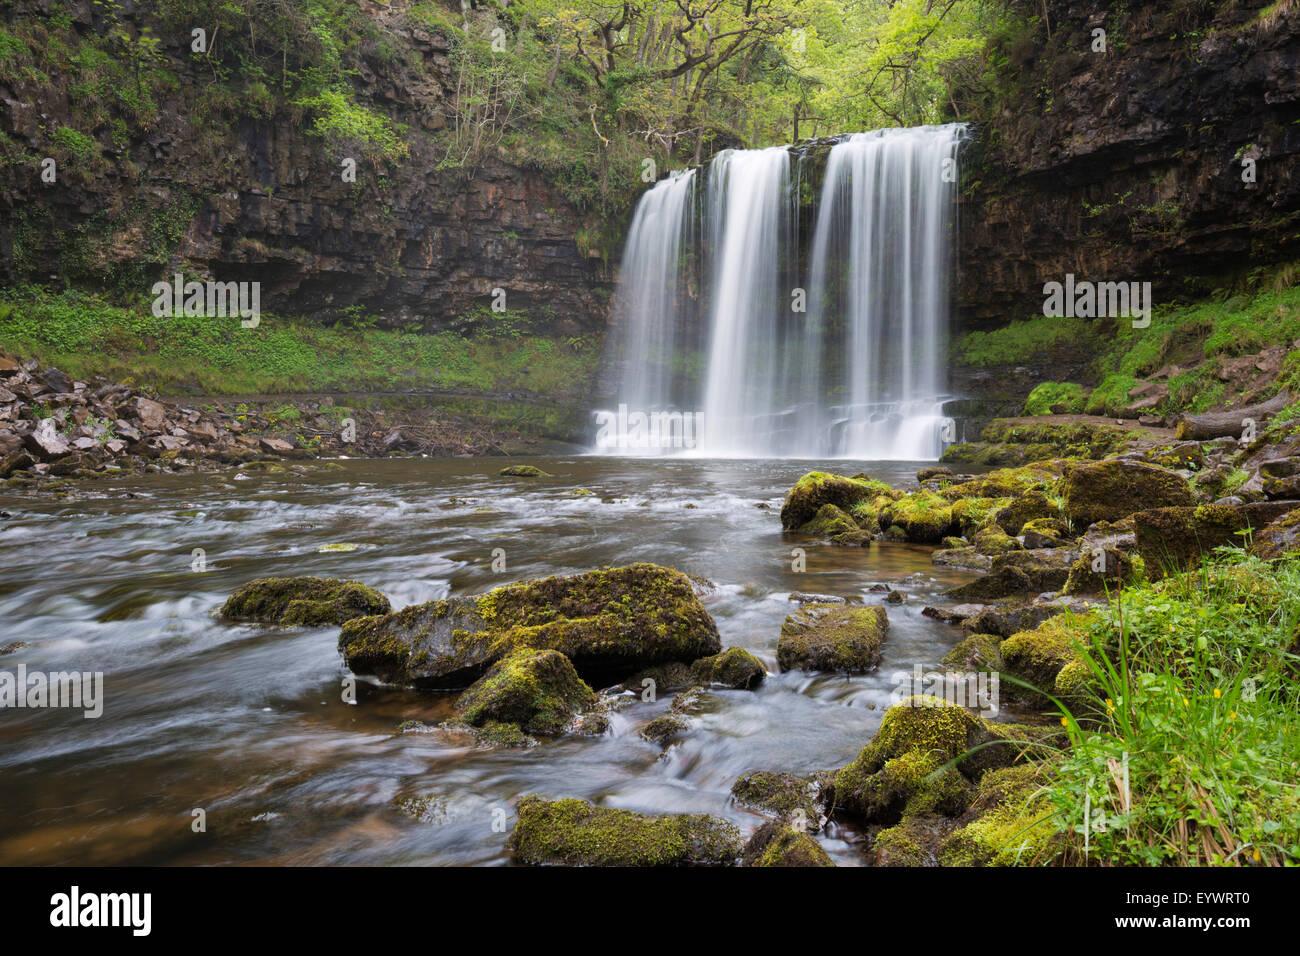 Sgwd yr Eira waterfall, Ystradfellte, Brecon Beacons National Park, Powys, Wales, United Kingdom, Europe - Stock Image